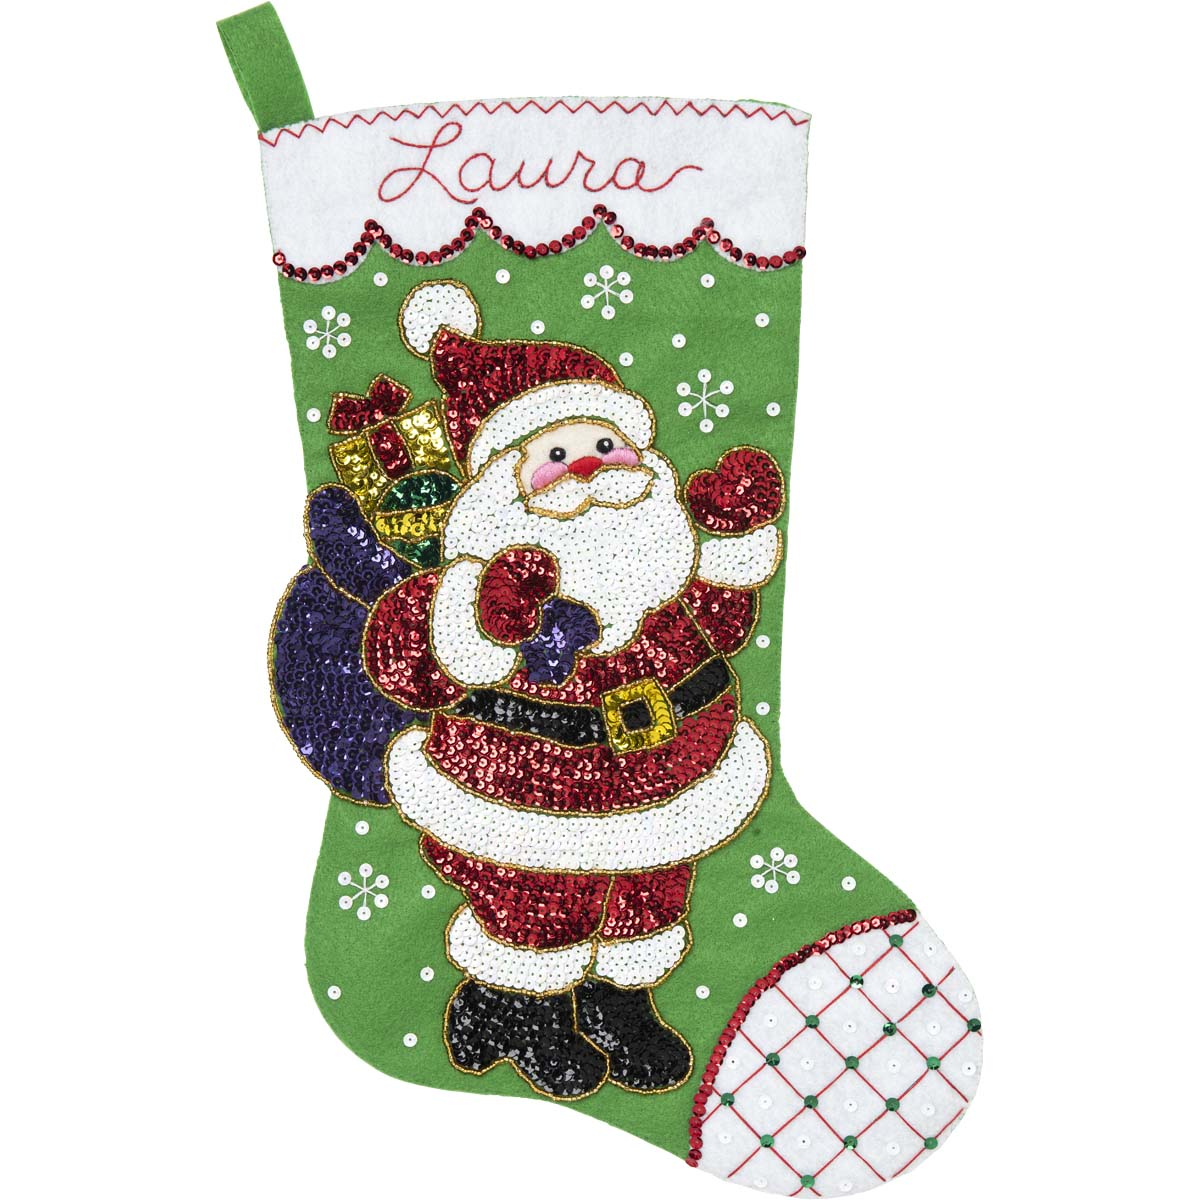 Glitz Santa 3.5 x 5 Bucilla 89263E Felt Applique Christmas Ornament Kit